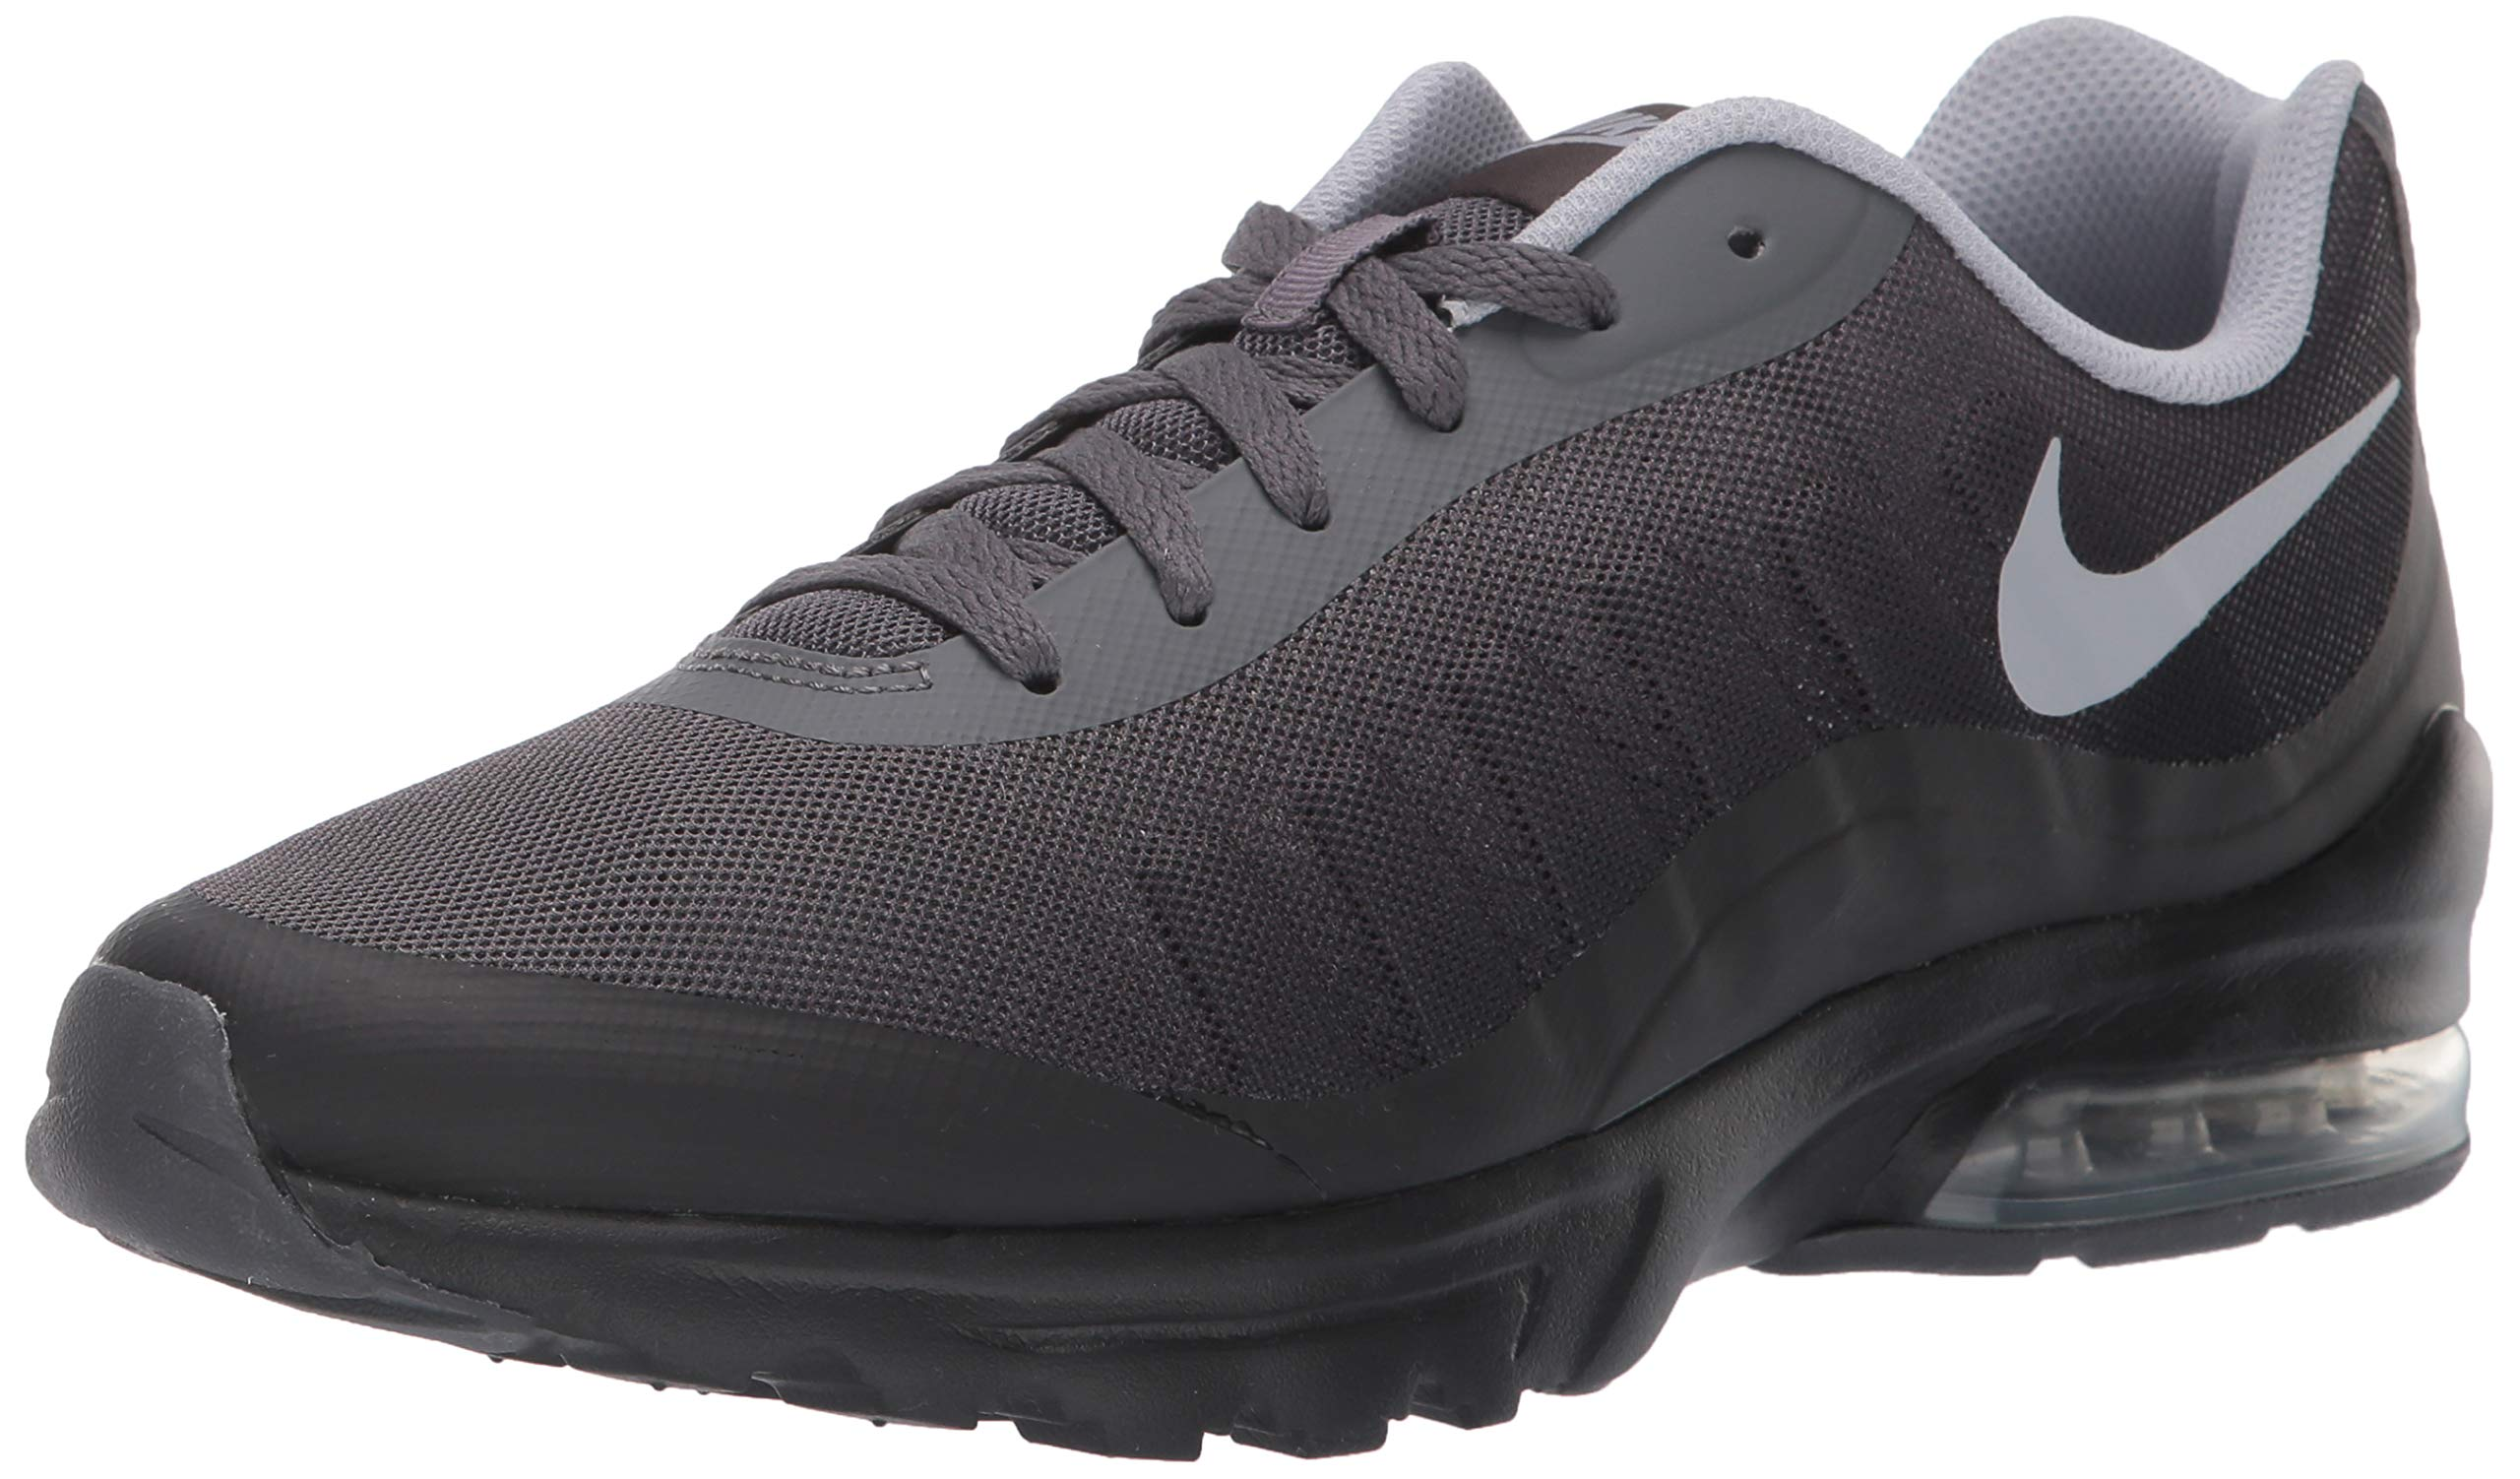 81195e77cf84a1 Galleon - NIKE Men s Air Max Invigor Print Running Shoes